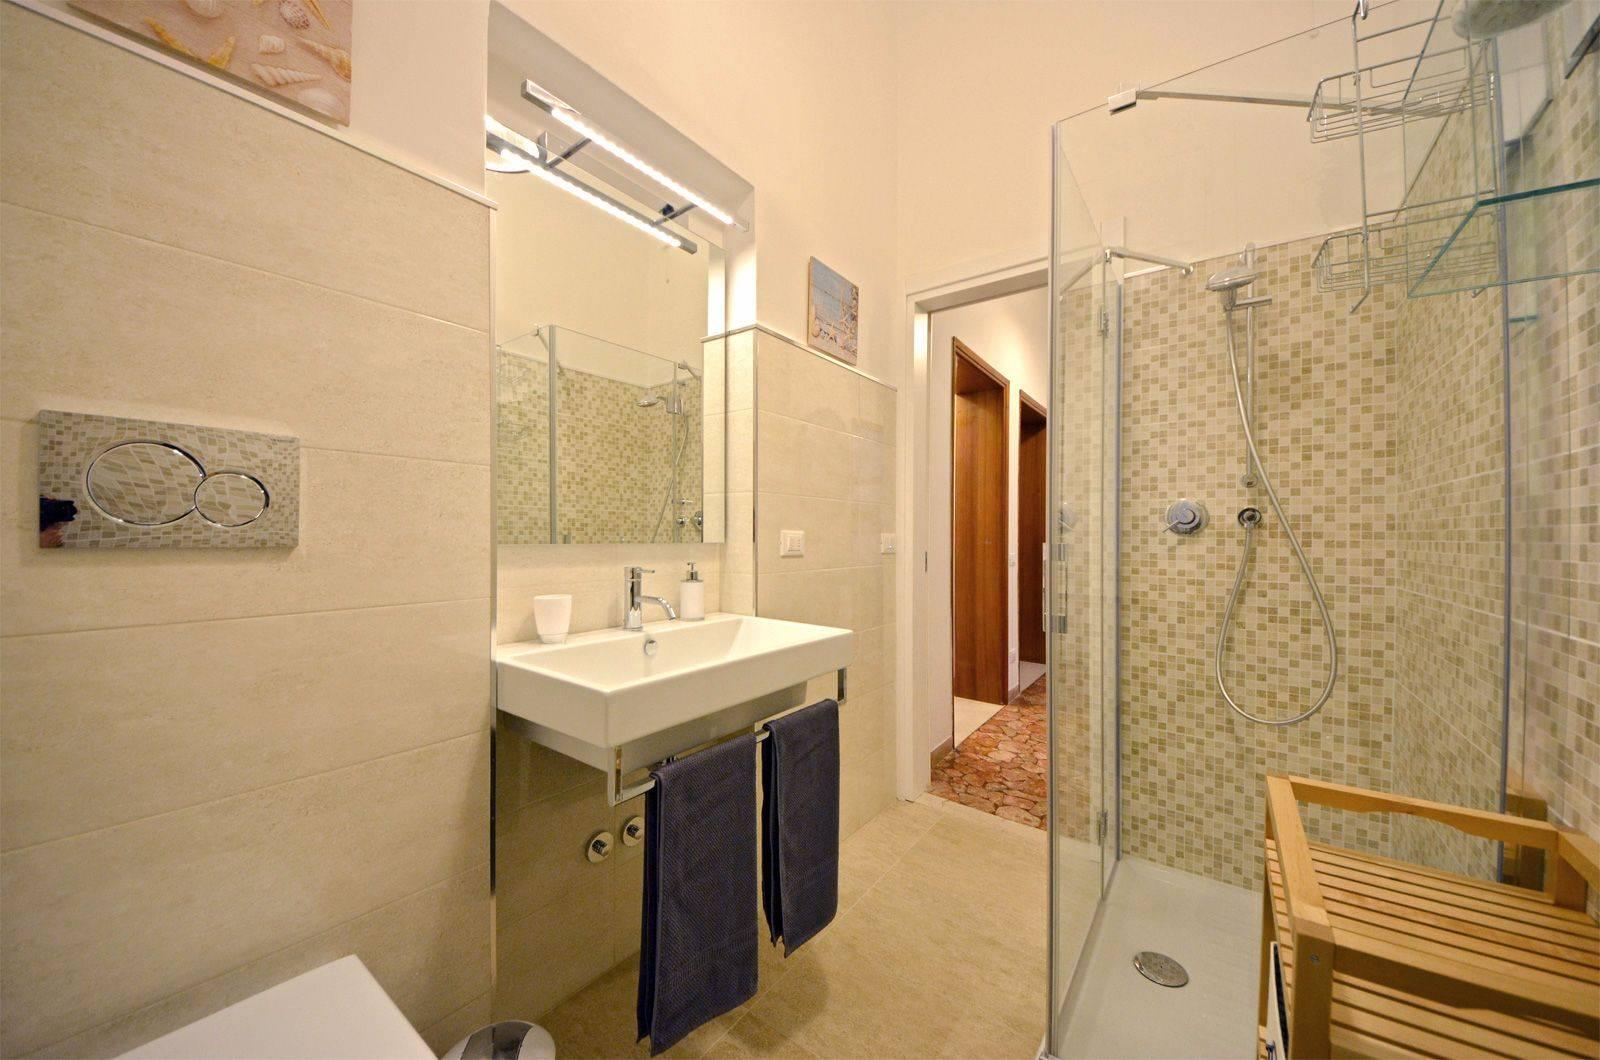 bathroom 1 of the Piano Nobile